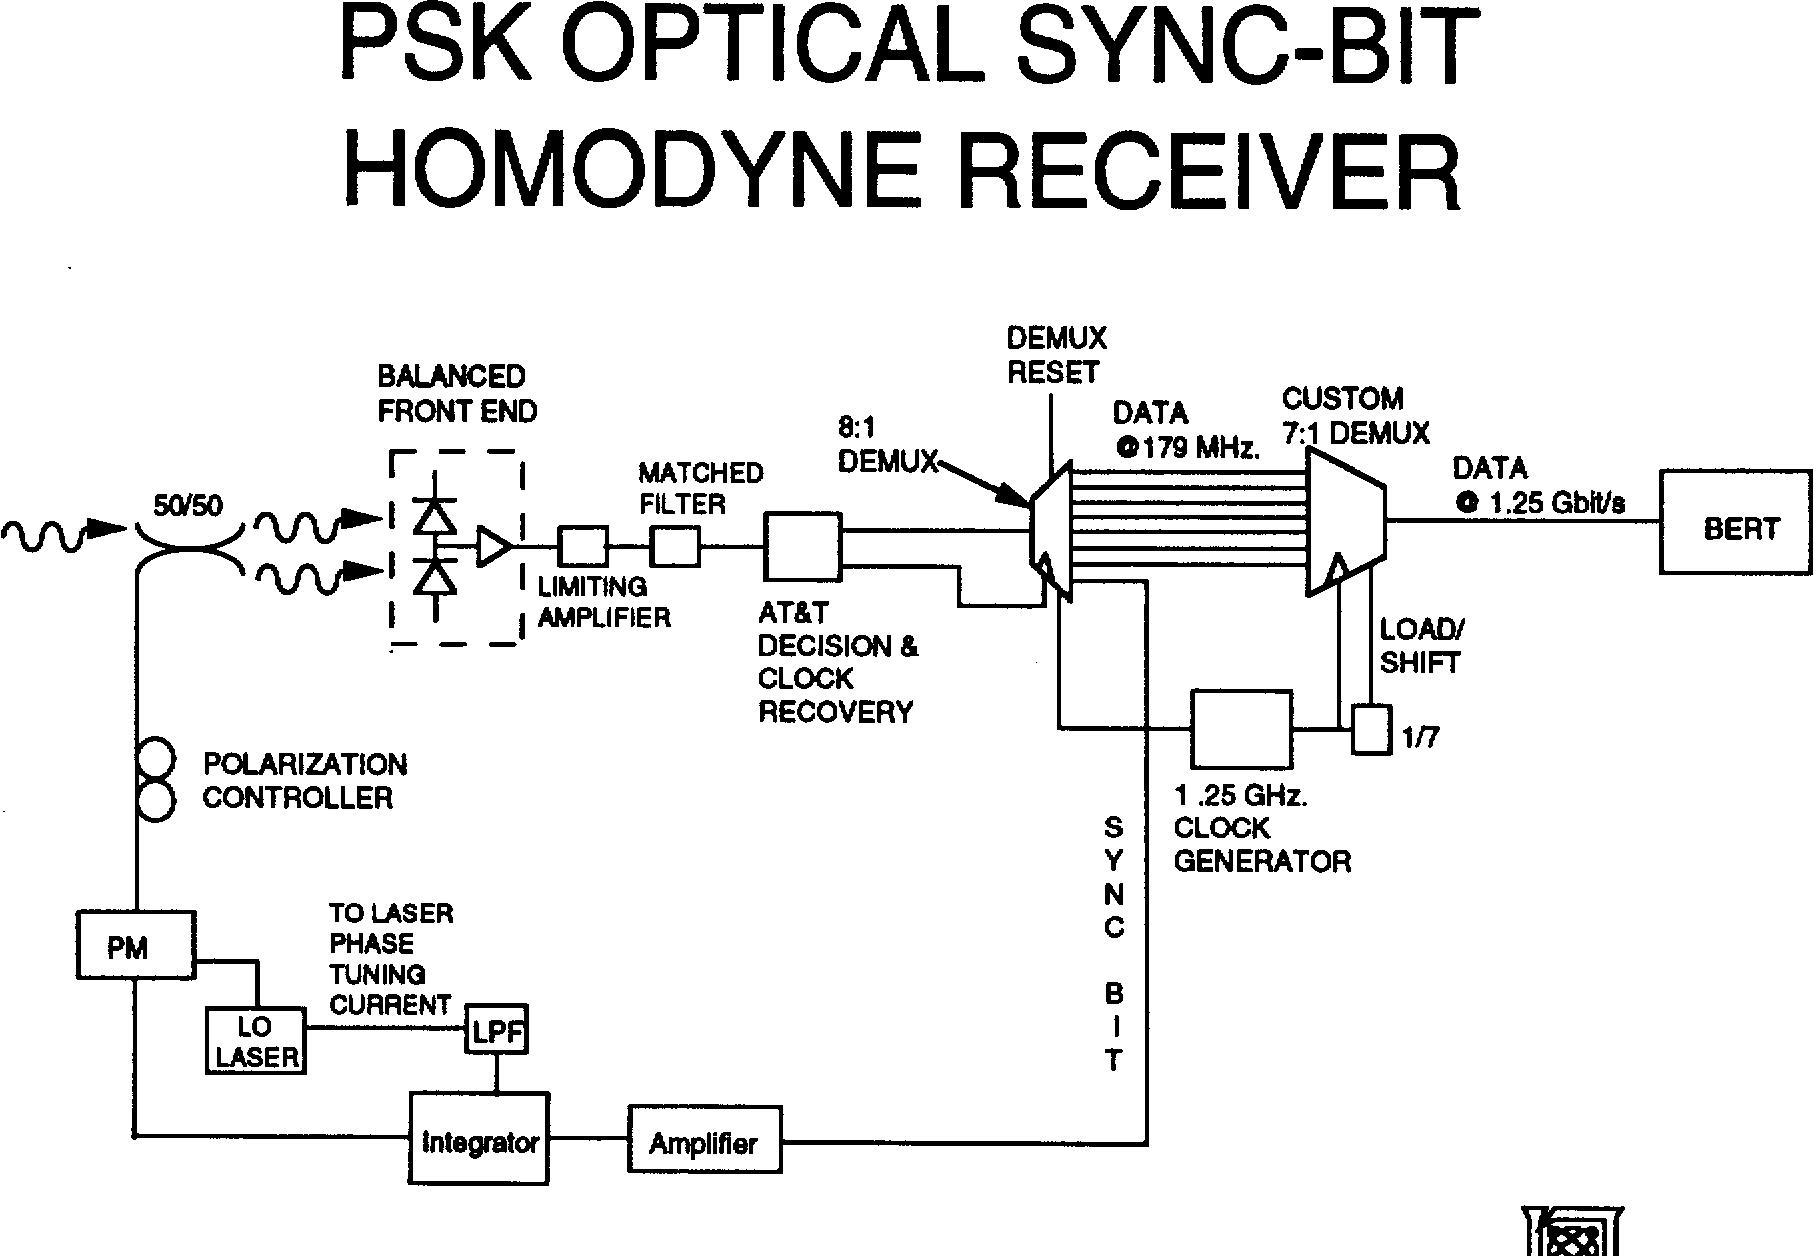 8 Psk Block Diagram Wiring Library Qam Receiver Optical Sync Bit Homodyne